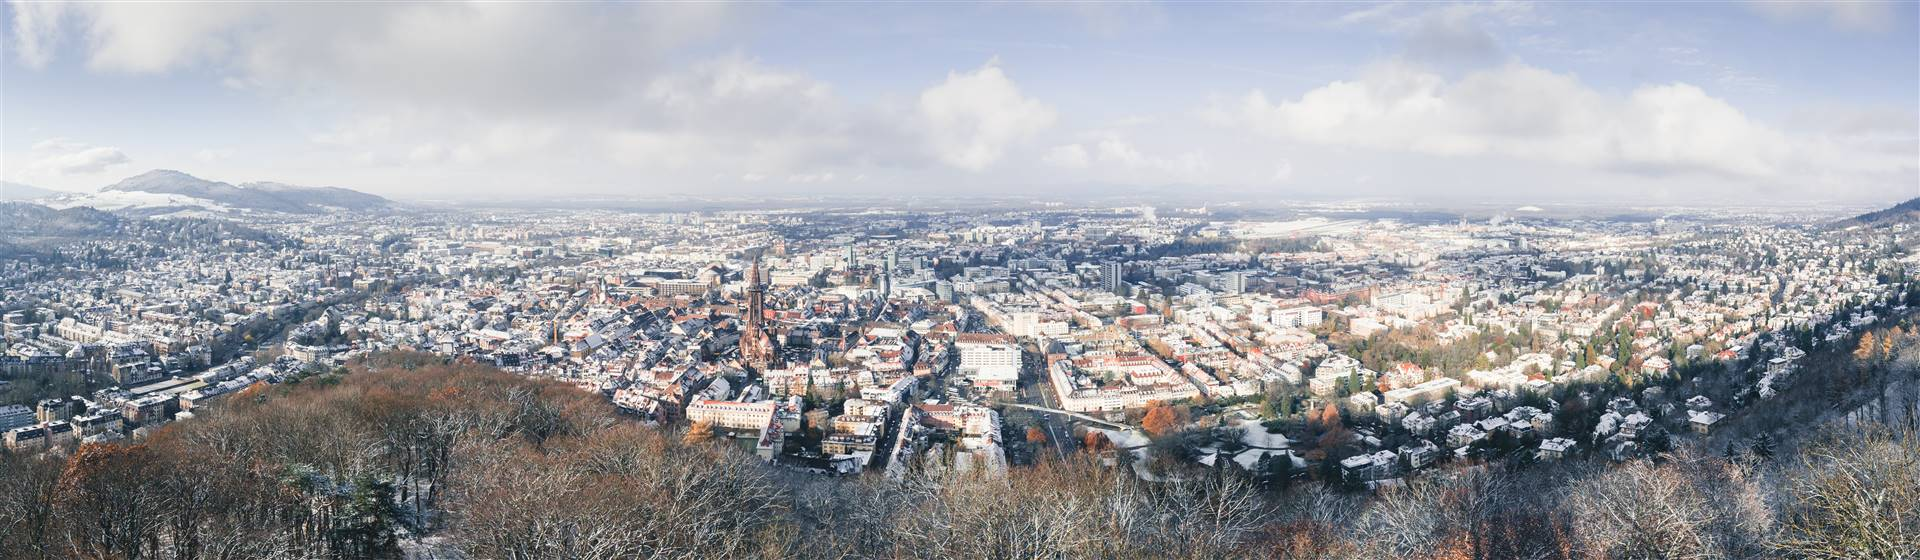 "<img src=""stbfn2020-adobestock_183345449.jpeg"" alt=""Freiburg in Winter""/>"